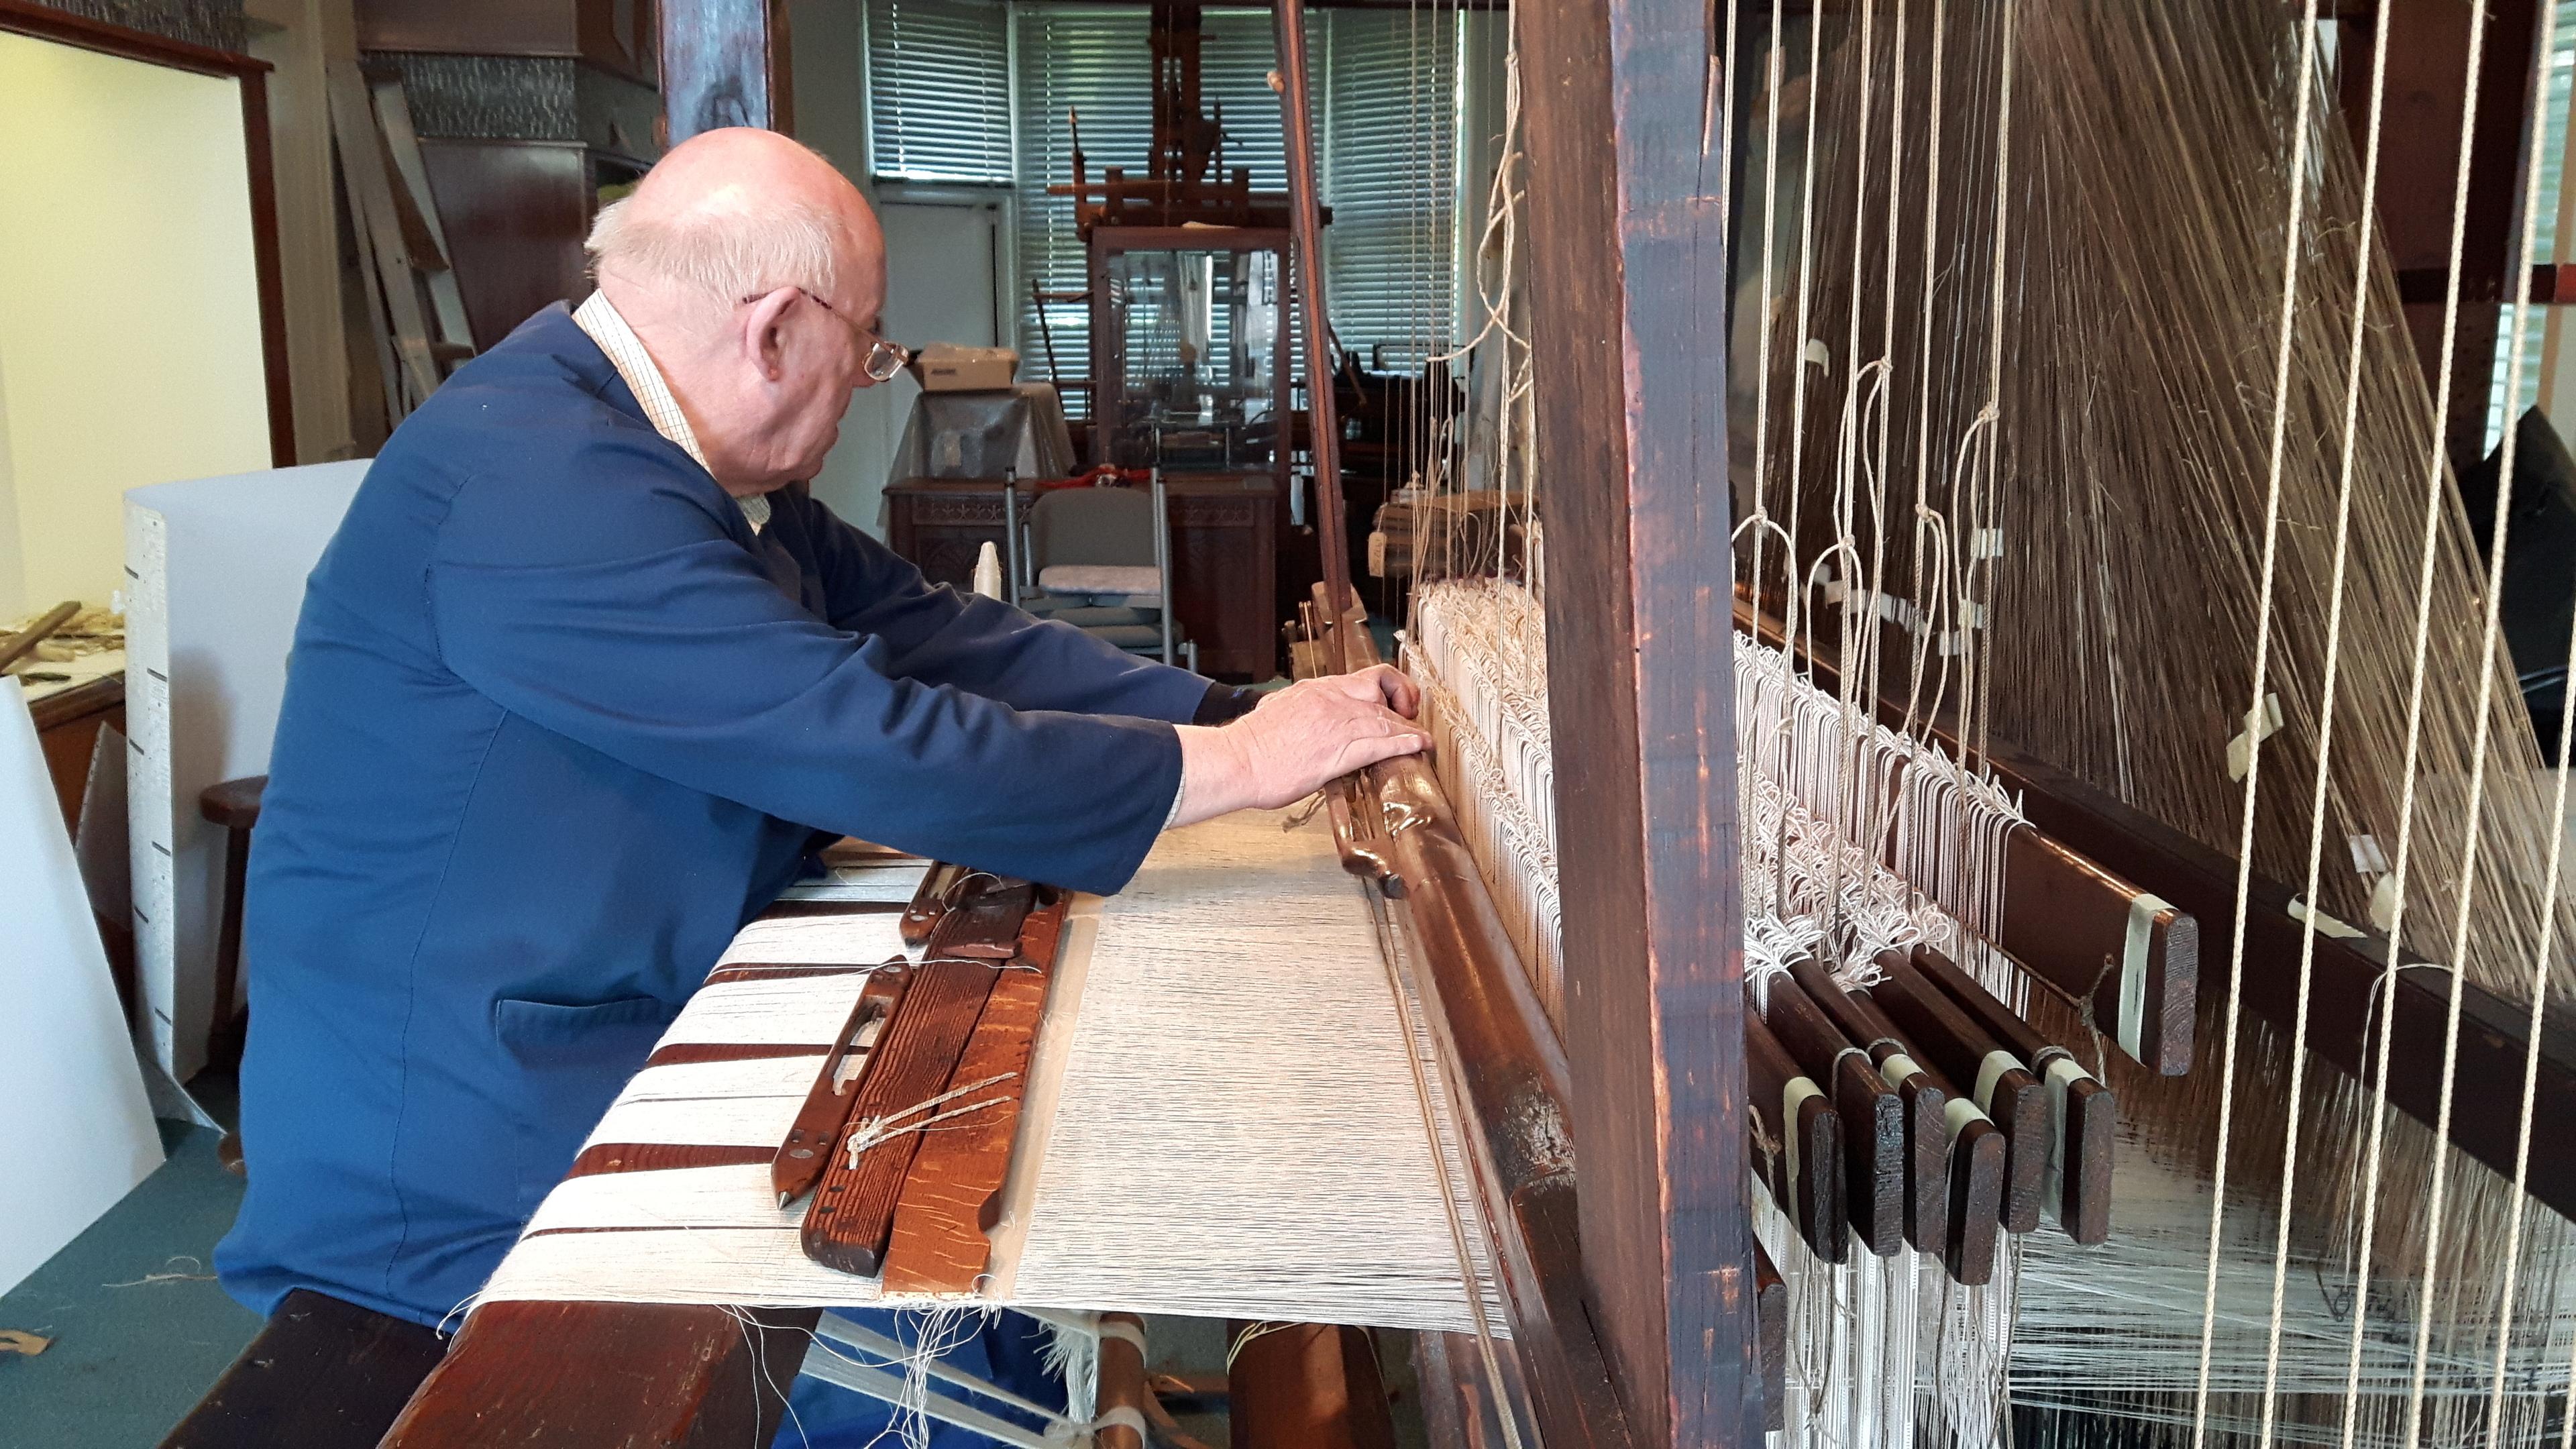 Ian Dale operating the historic loom.